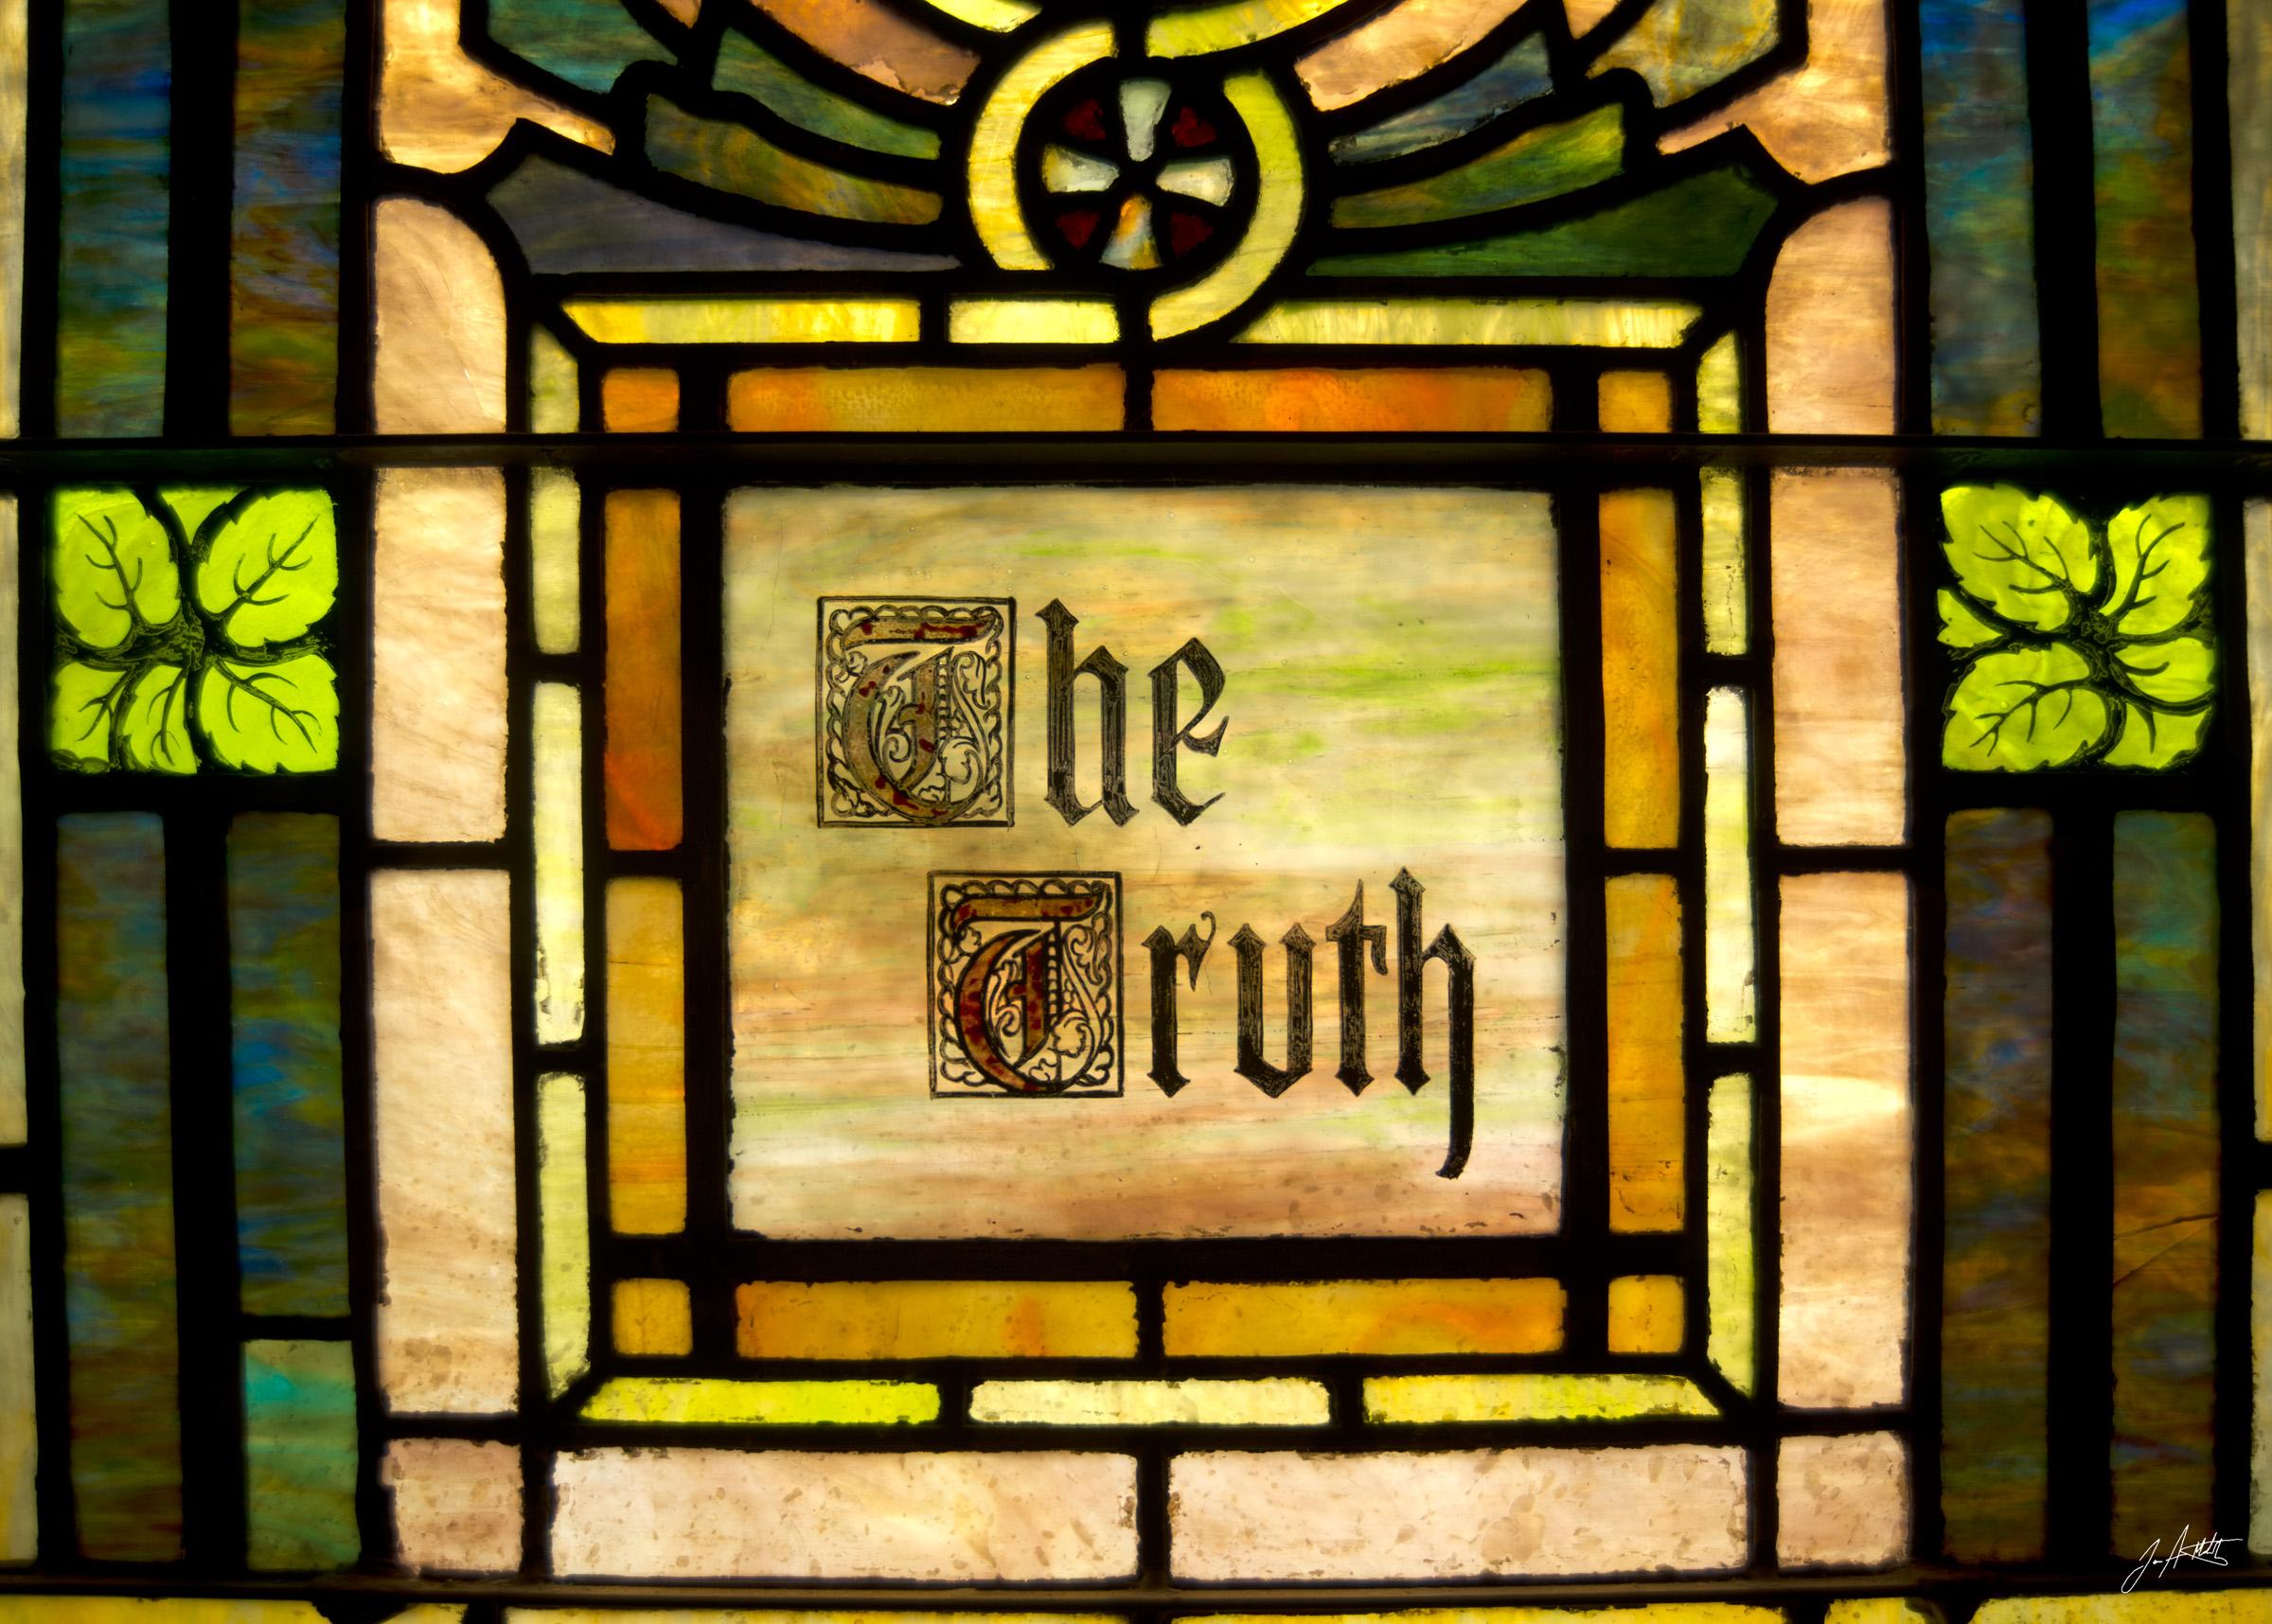 Day264_the truth_September21